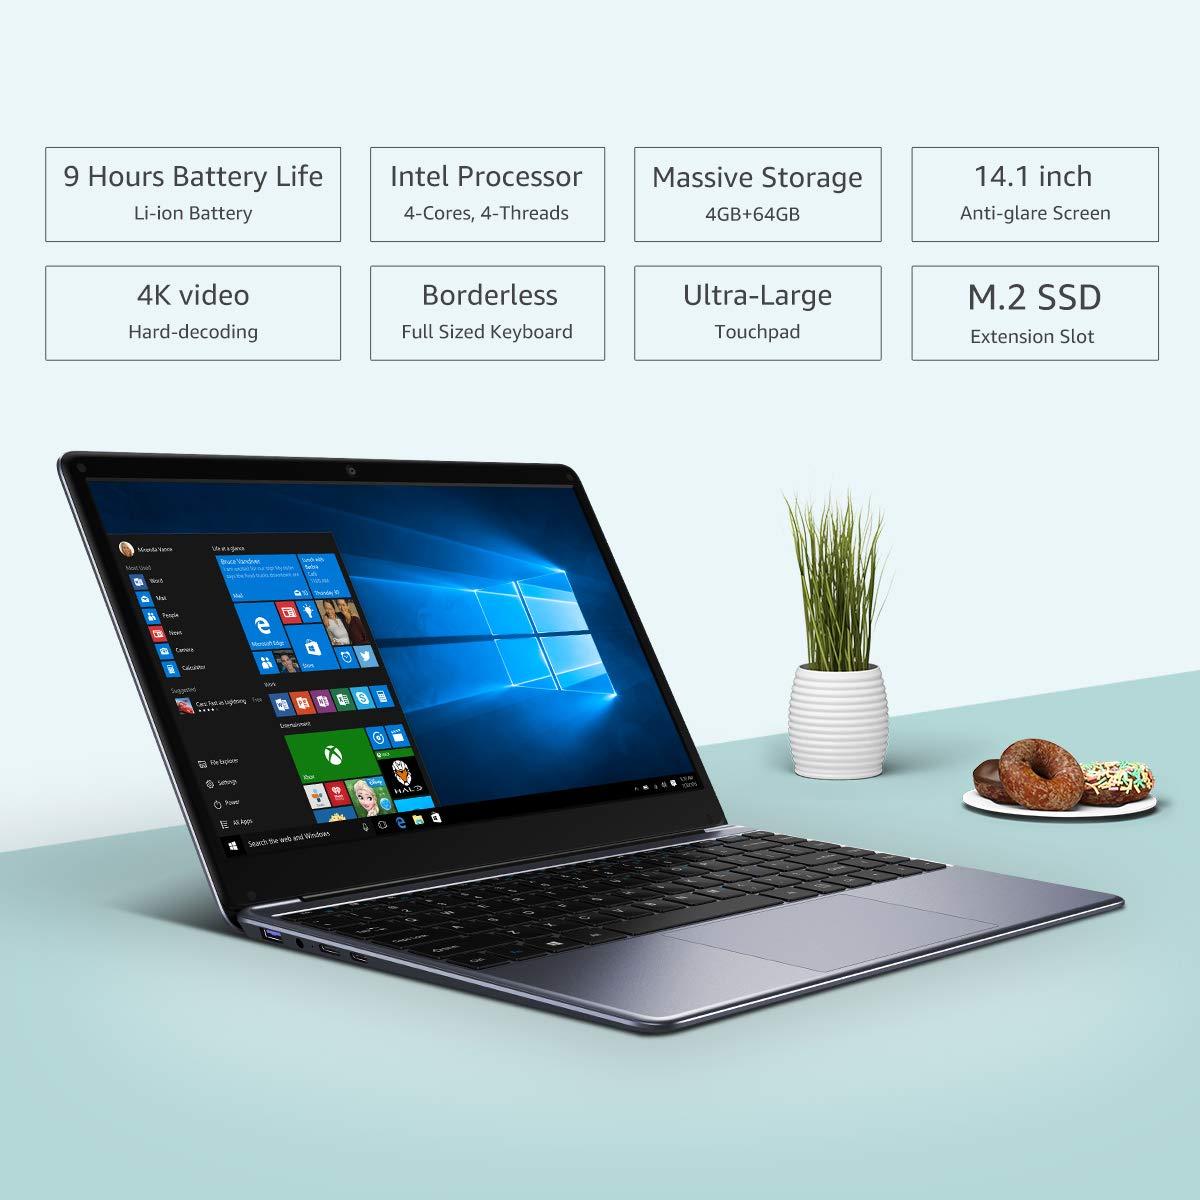 Amazon.com: CHUWI herobook 14.1 inch Windows 10 Intel Atom X5-E8000 Quad Core 4GB RAM 64GB ROM Notebook with Mini Portable HDMI,Thin and Lightweight ...